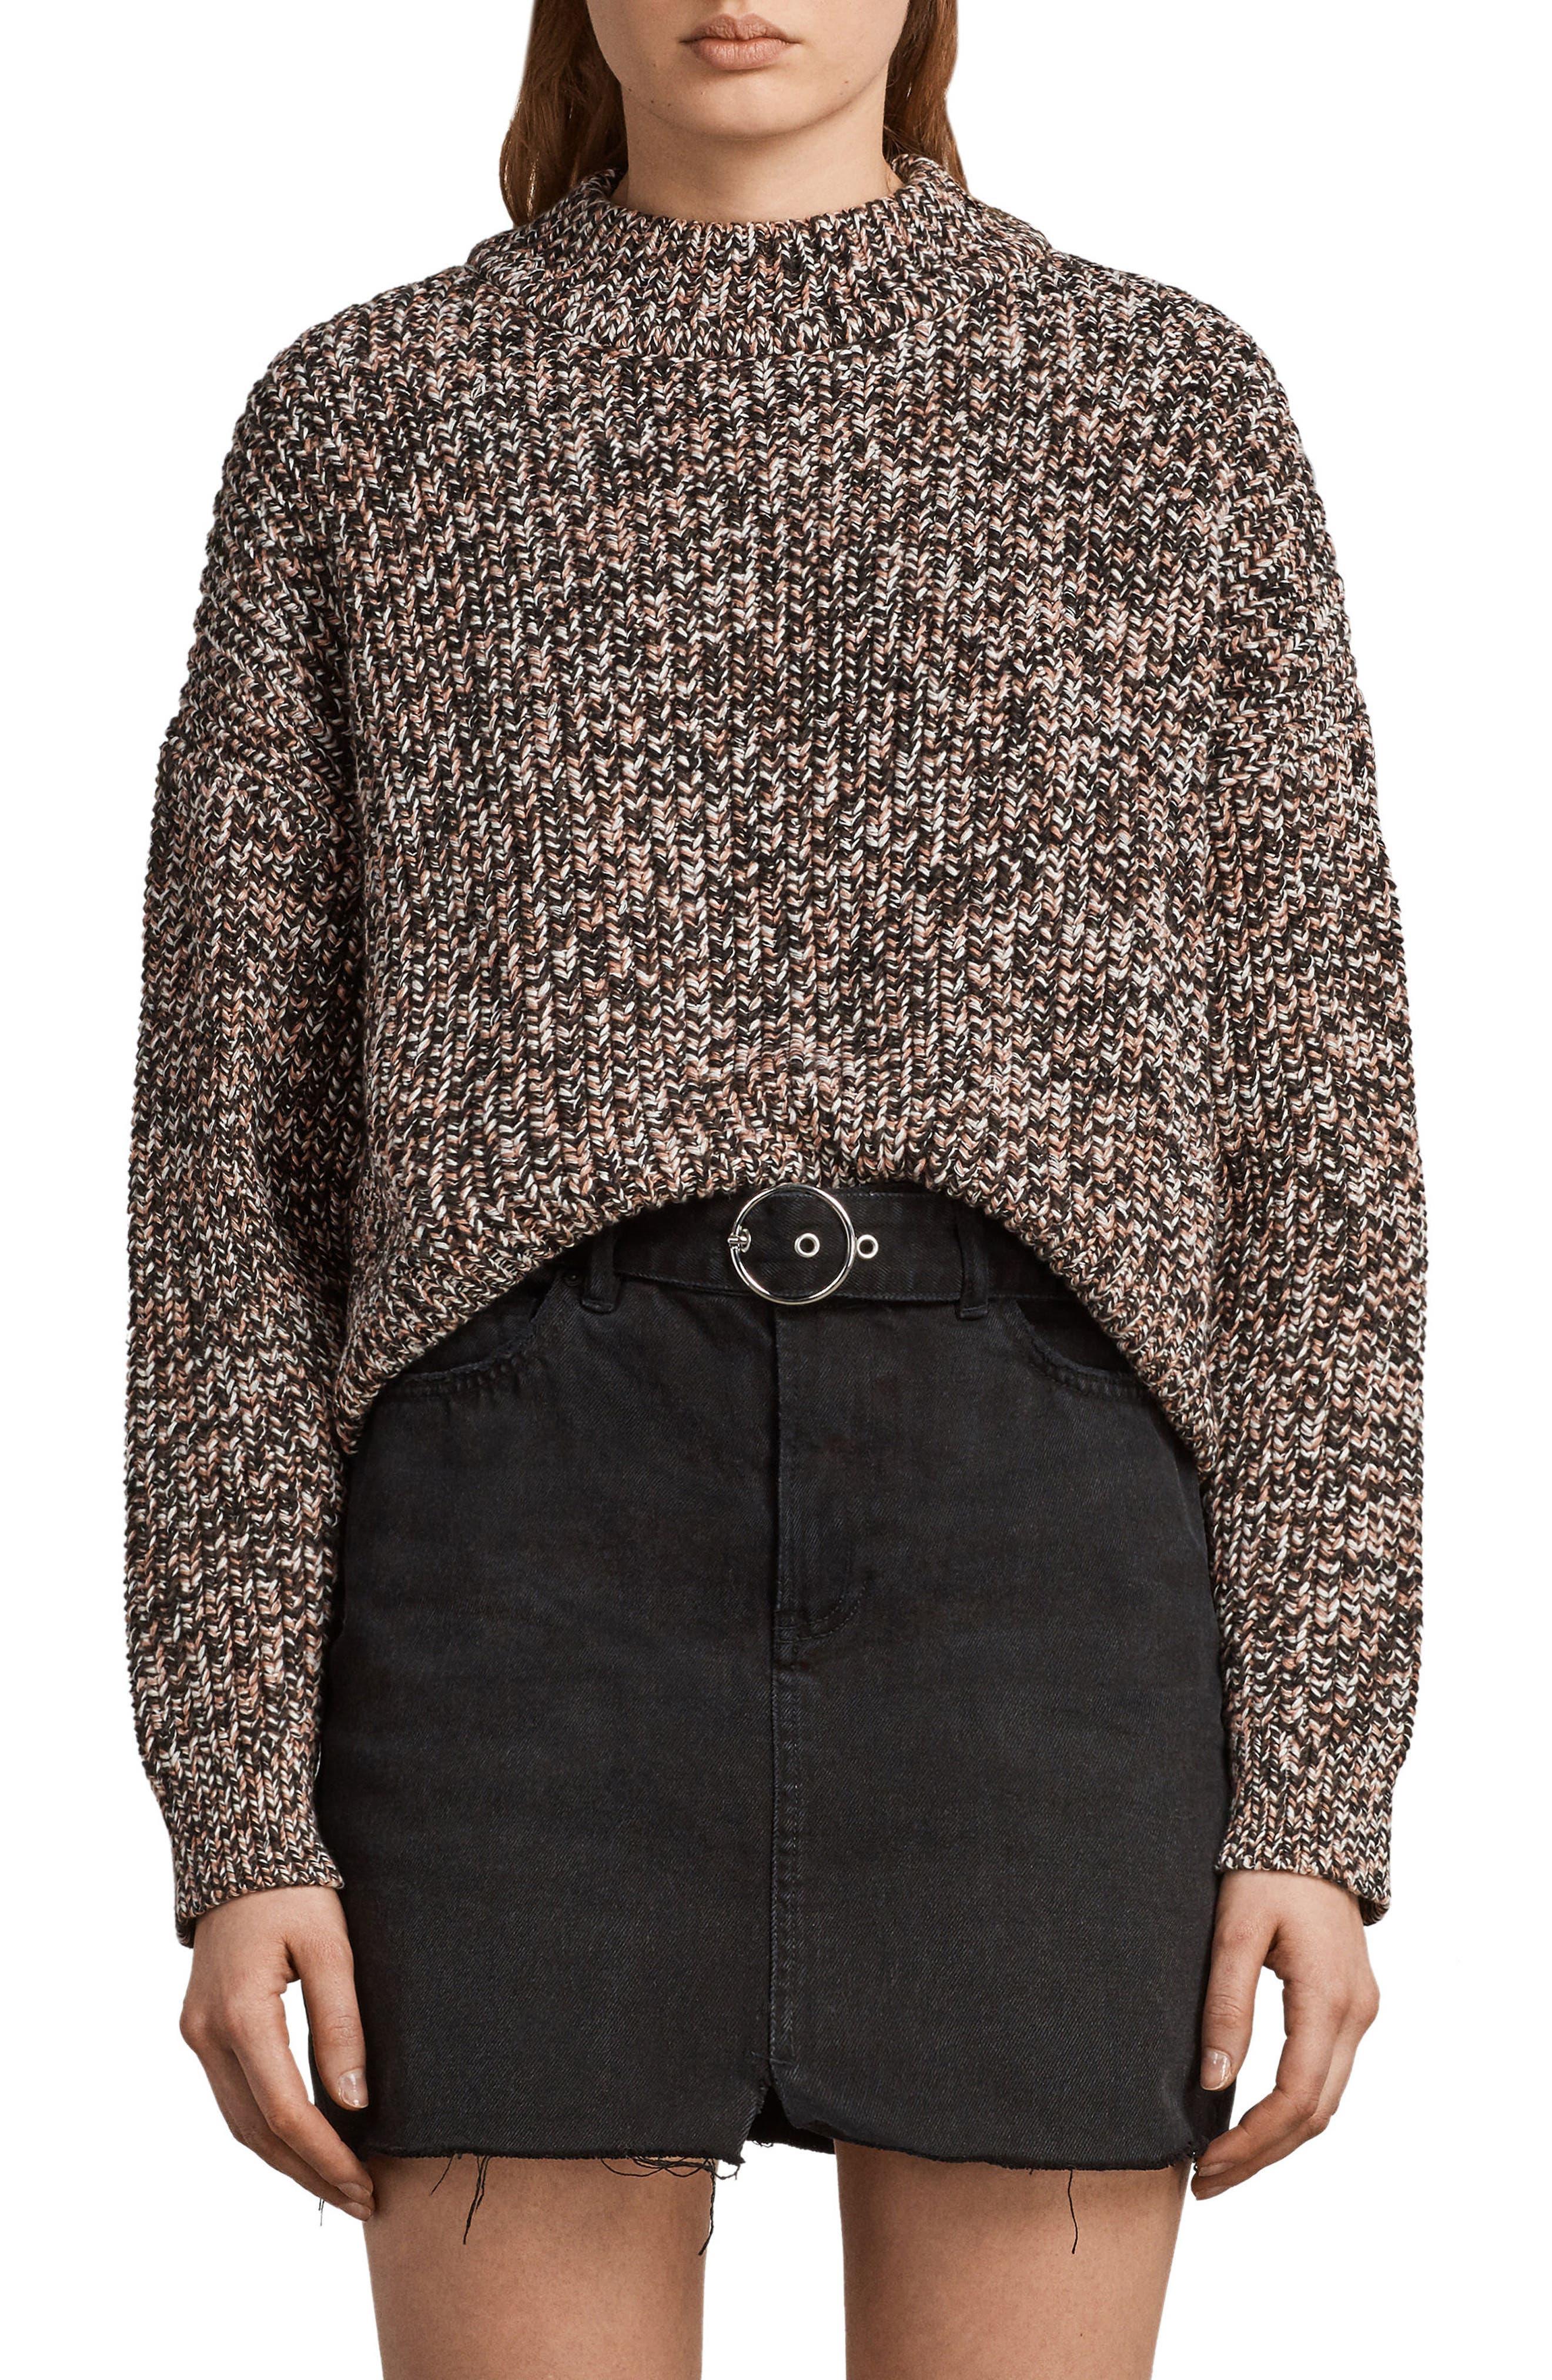 Malu Knit Sweater,                         Main,                         color, Pink Mix